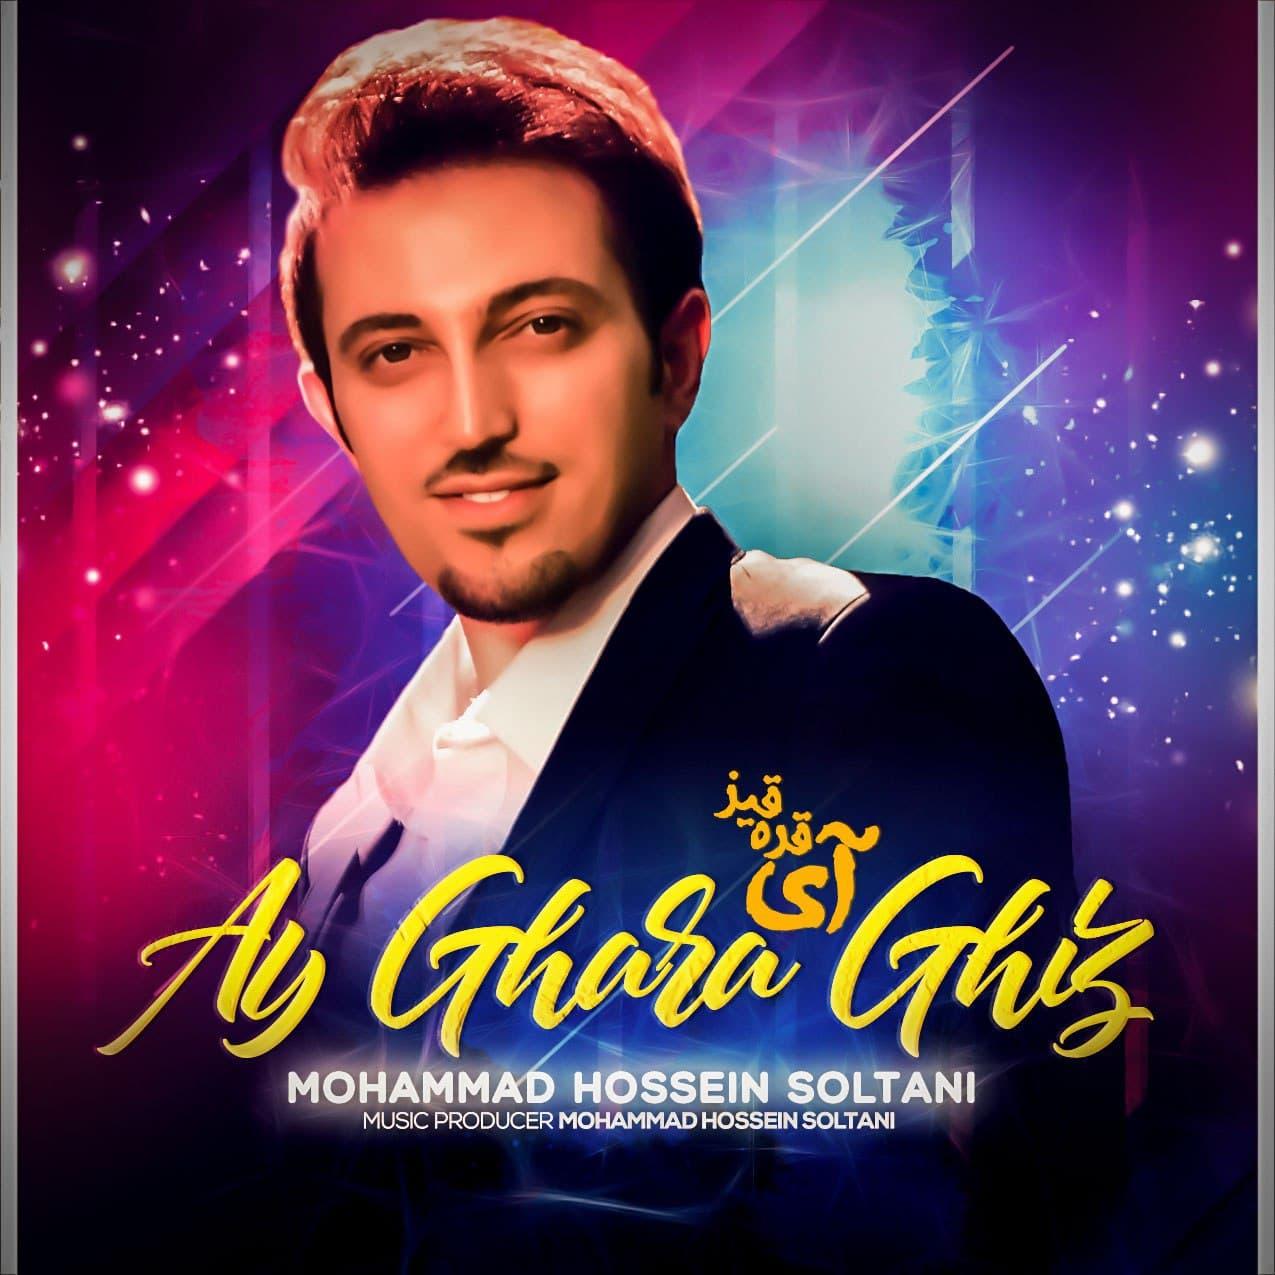 https://s16.picofile.com/file/8428742018/12Mohammad_Hosein_Soltani_Ay_Ghara_Ghiz.jpg